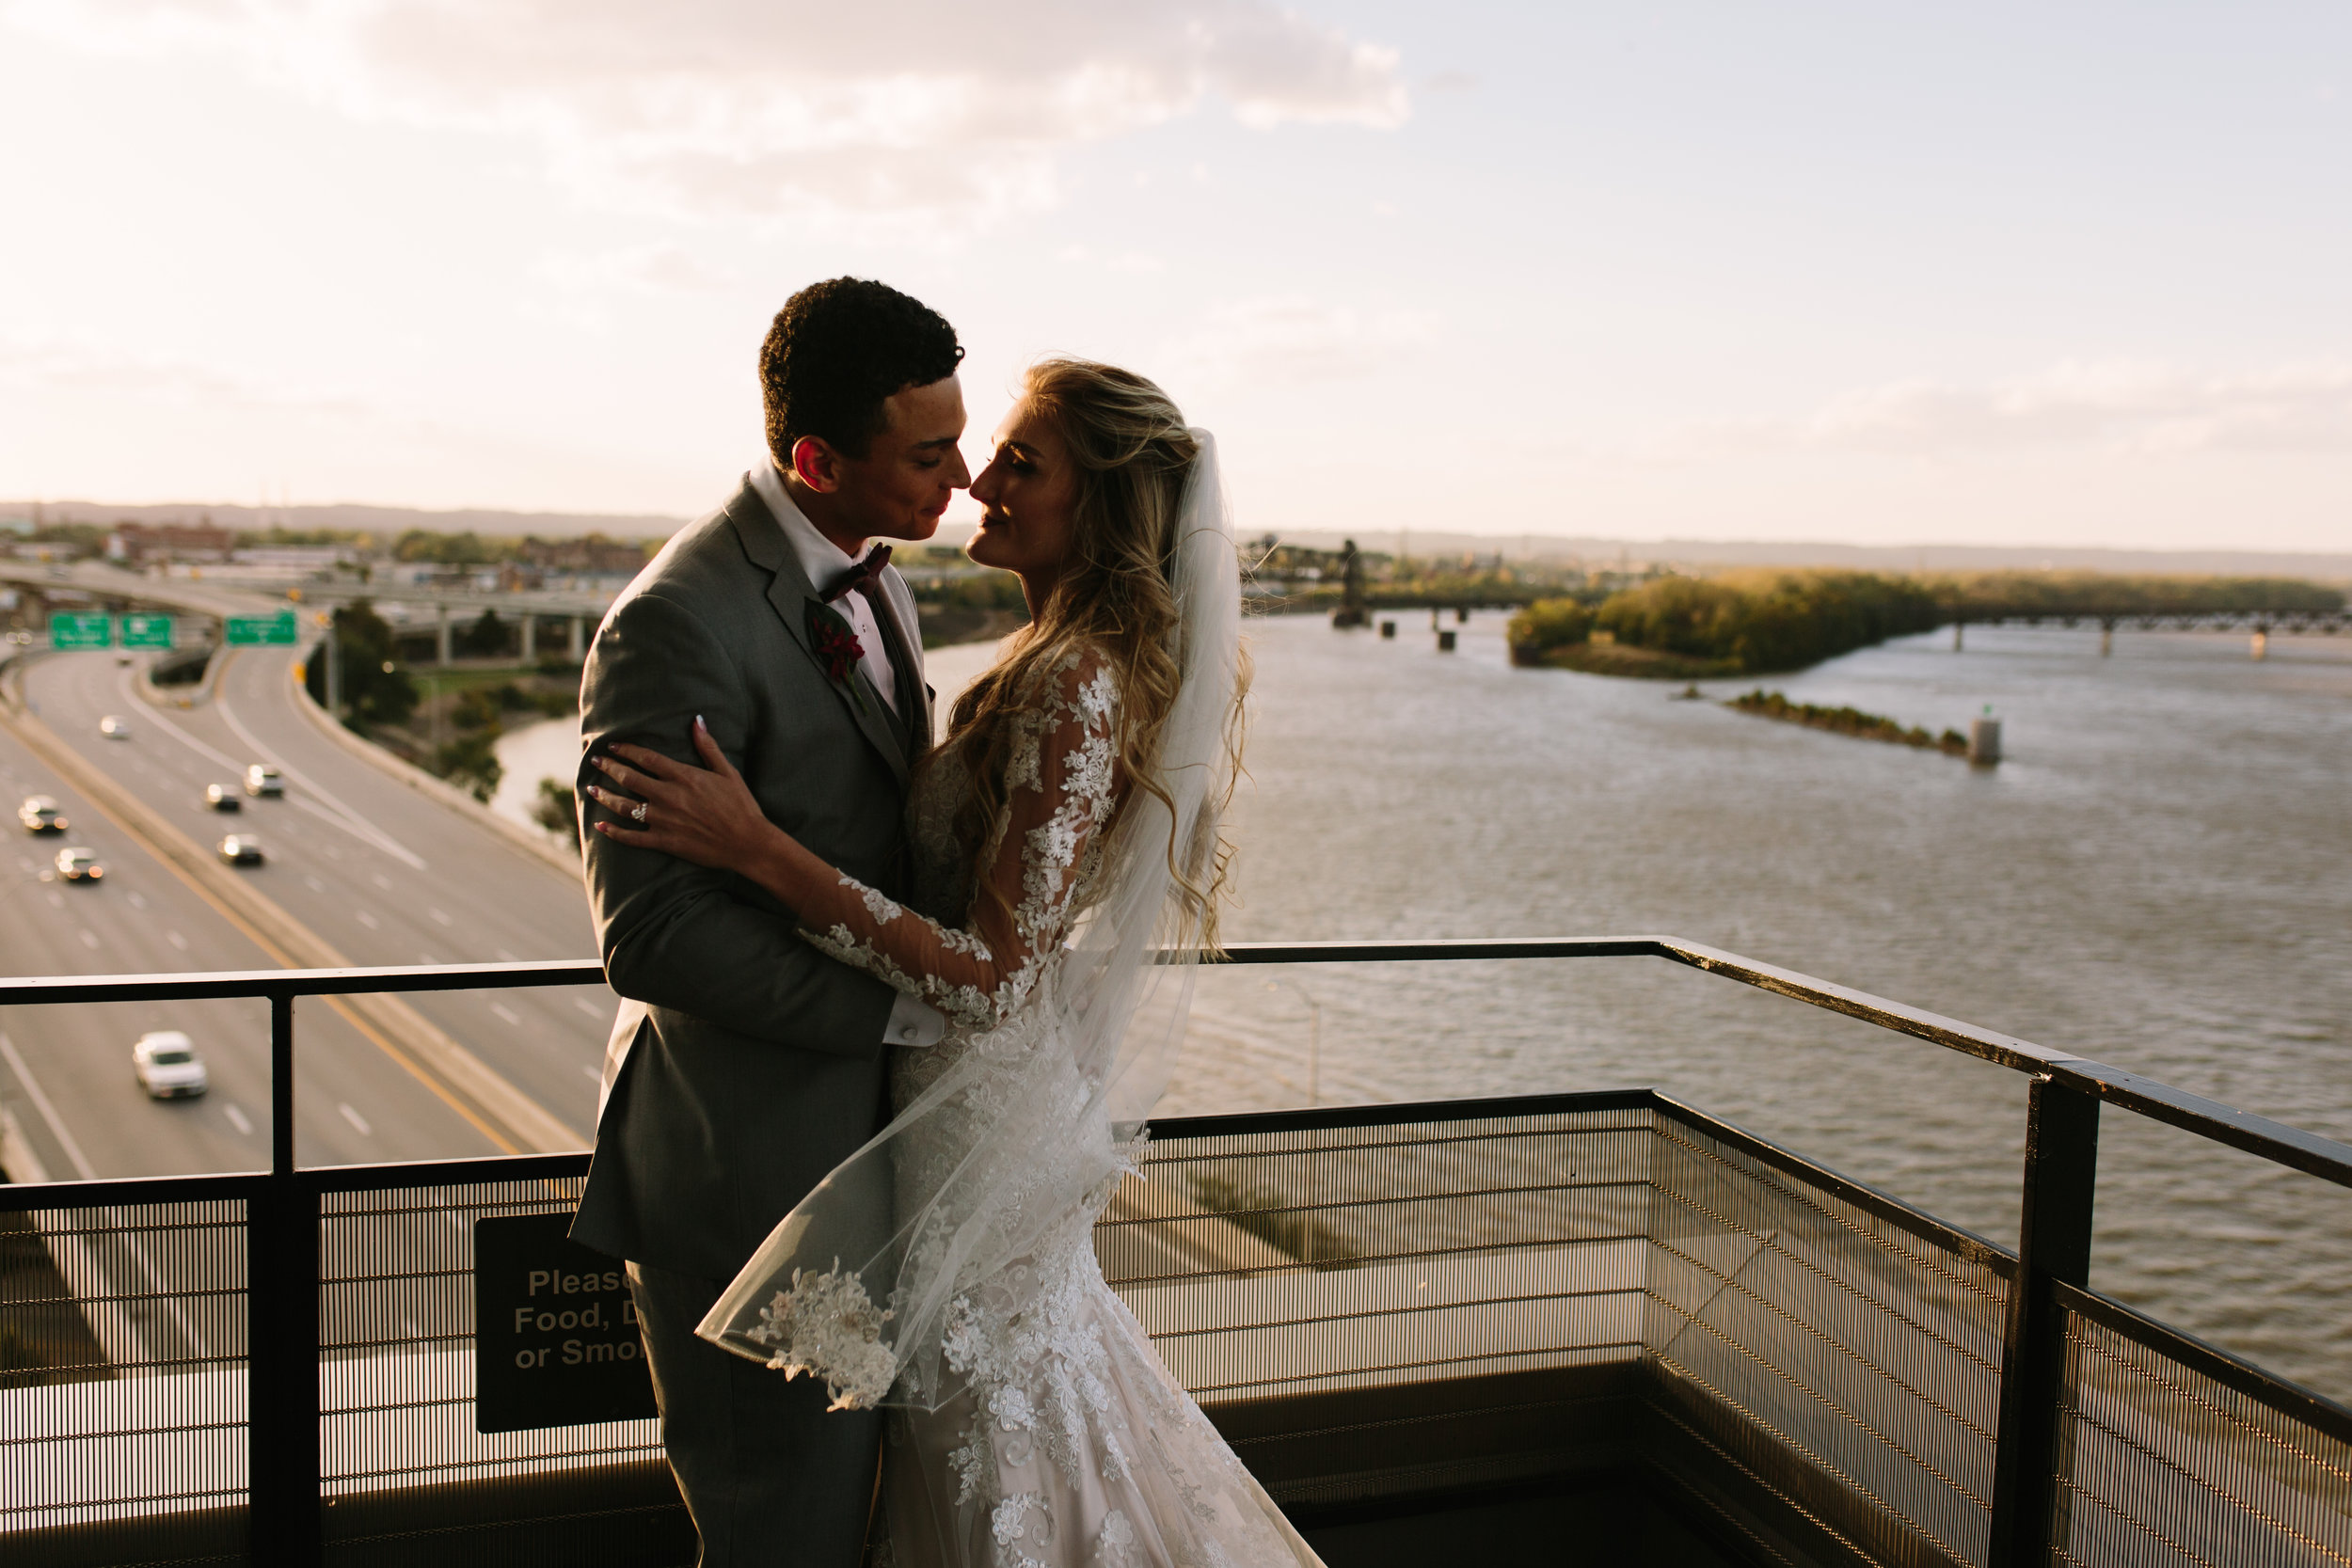 trent.and.kendra.photography.louisville.kentucky.wedding-42.jpg